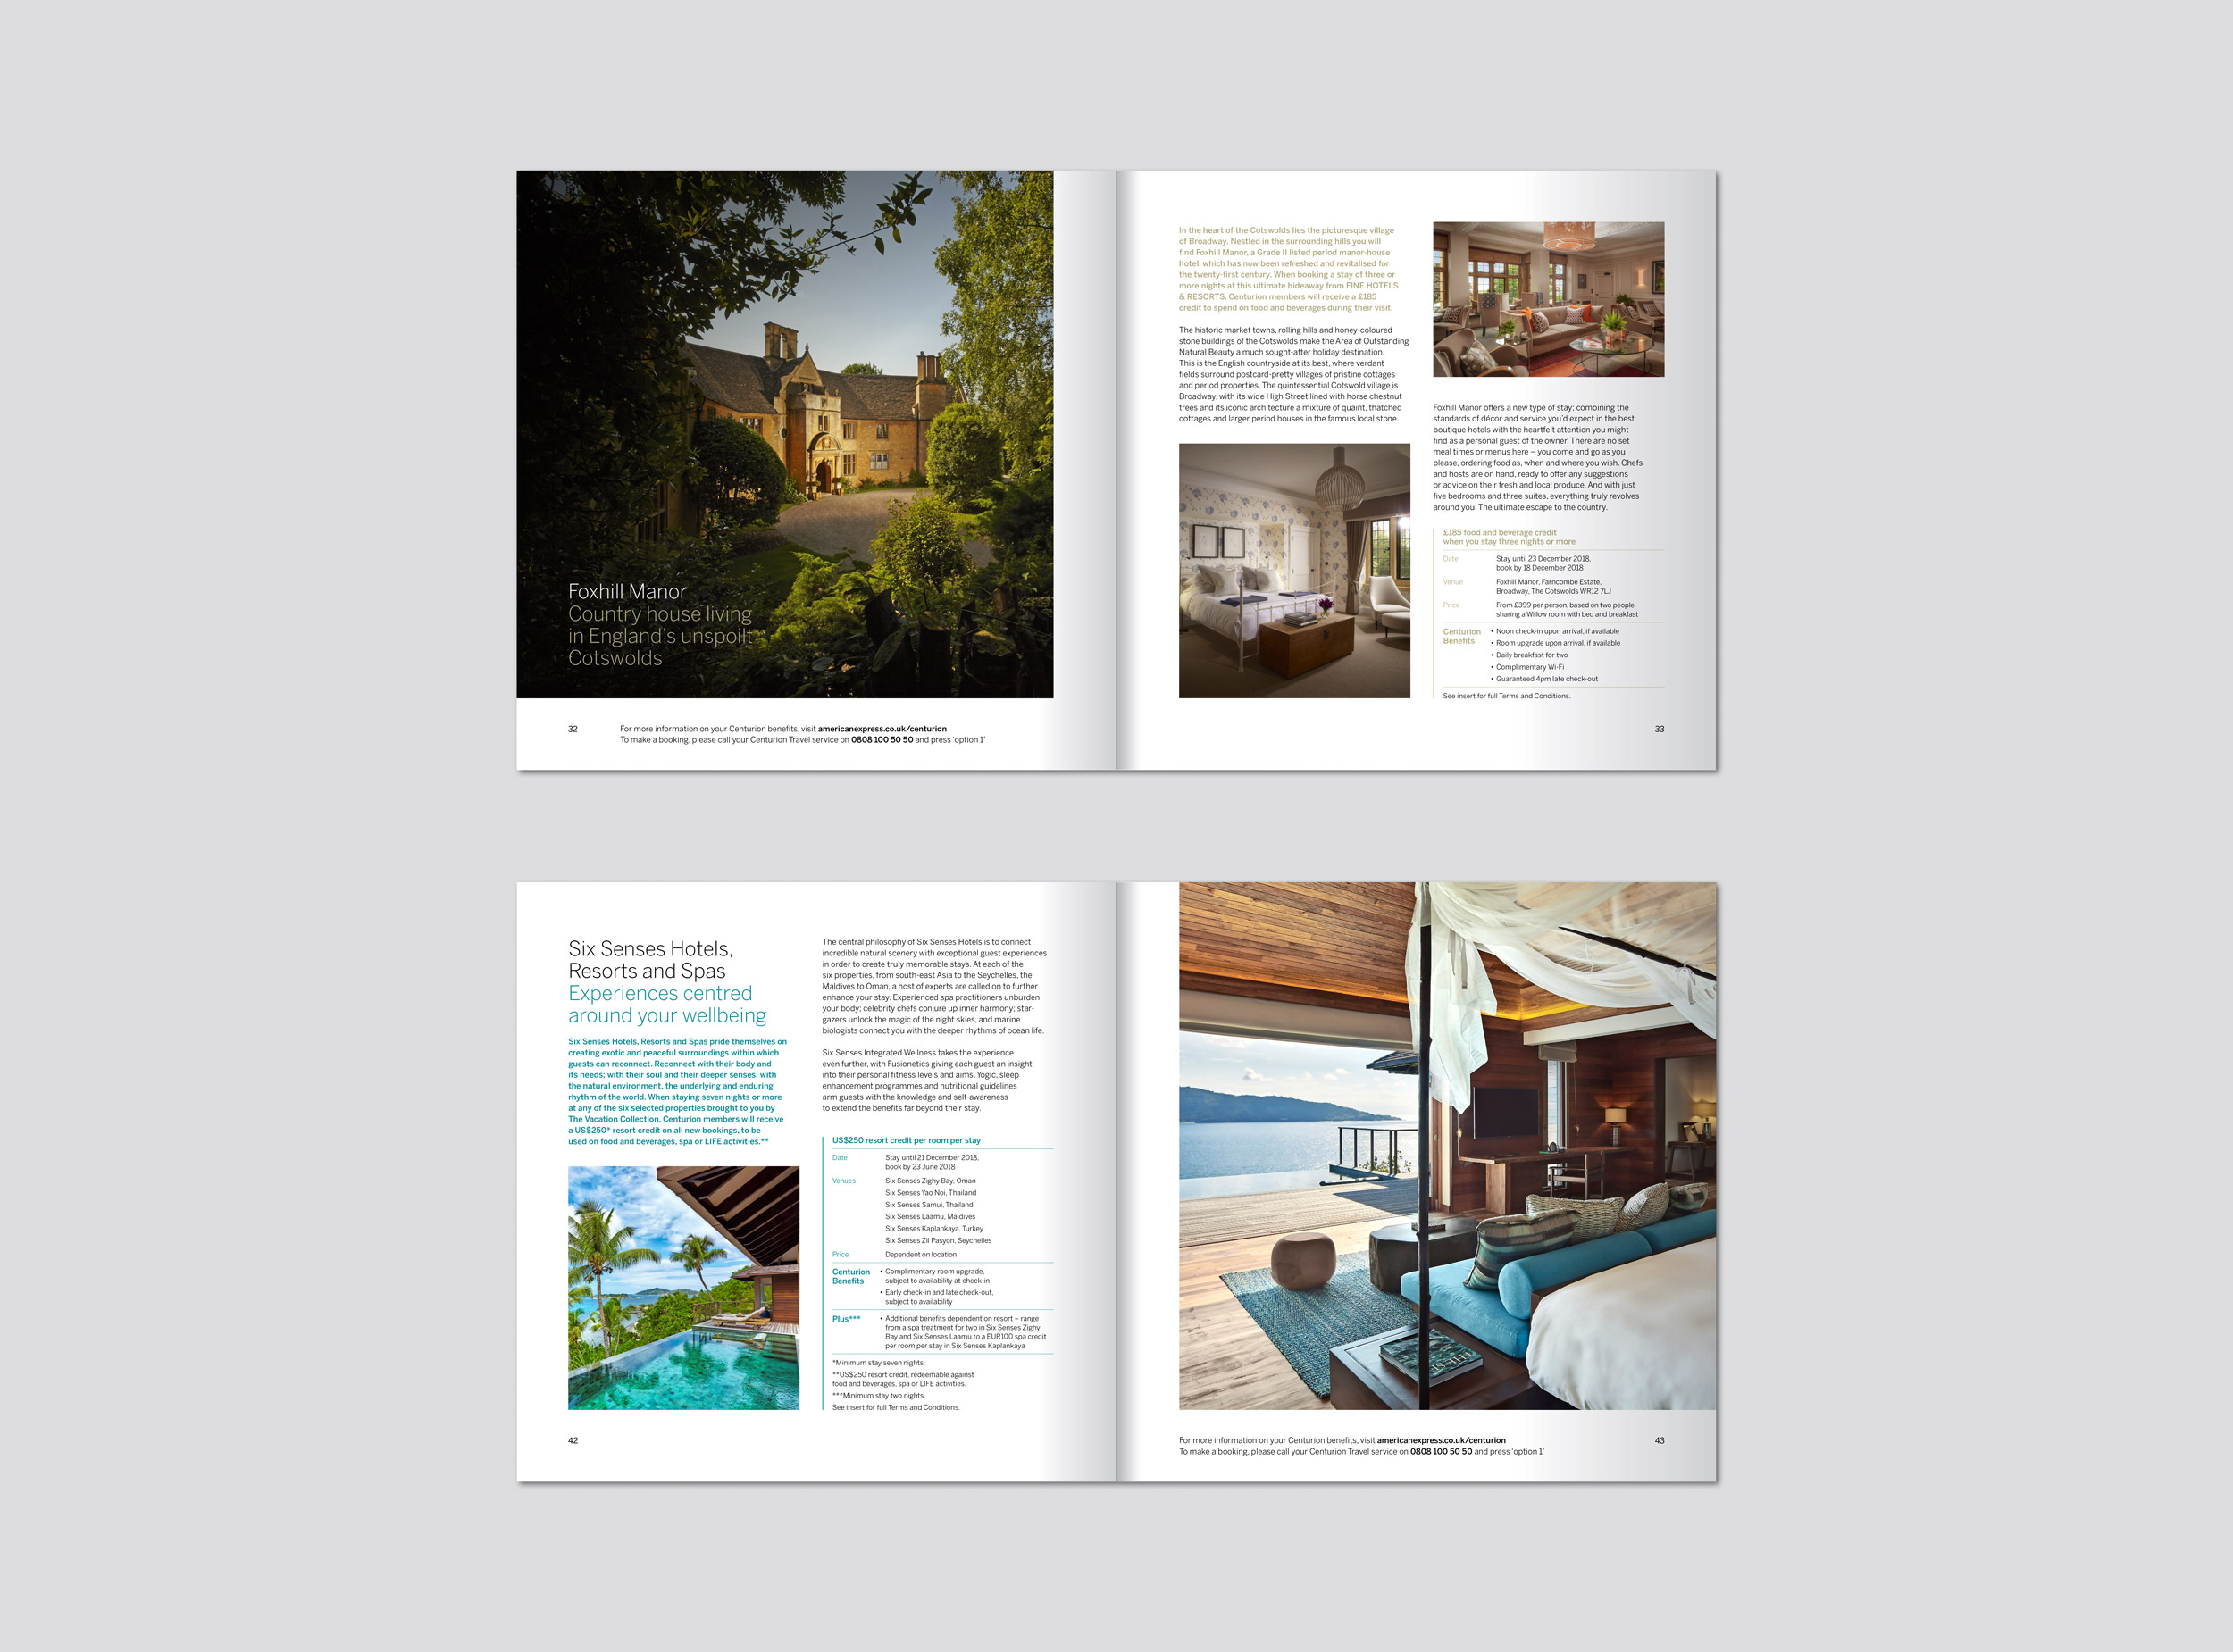 Bon Vivant & Preview for Amex - House of SL